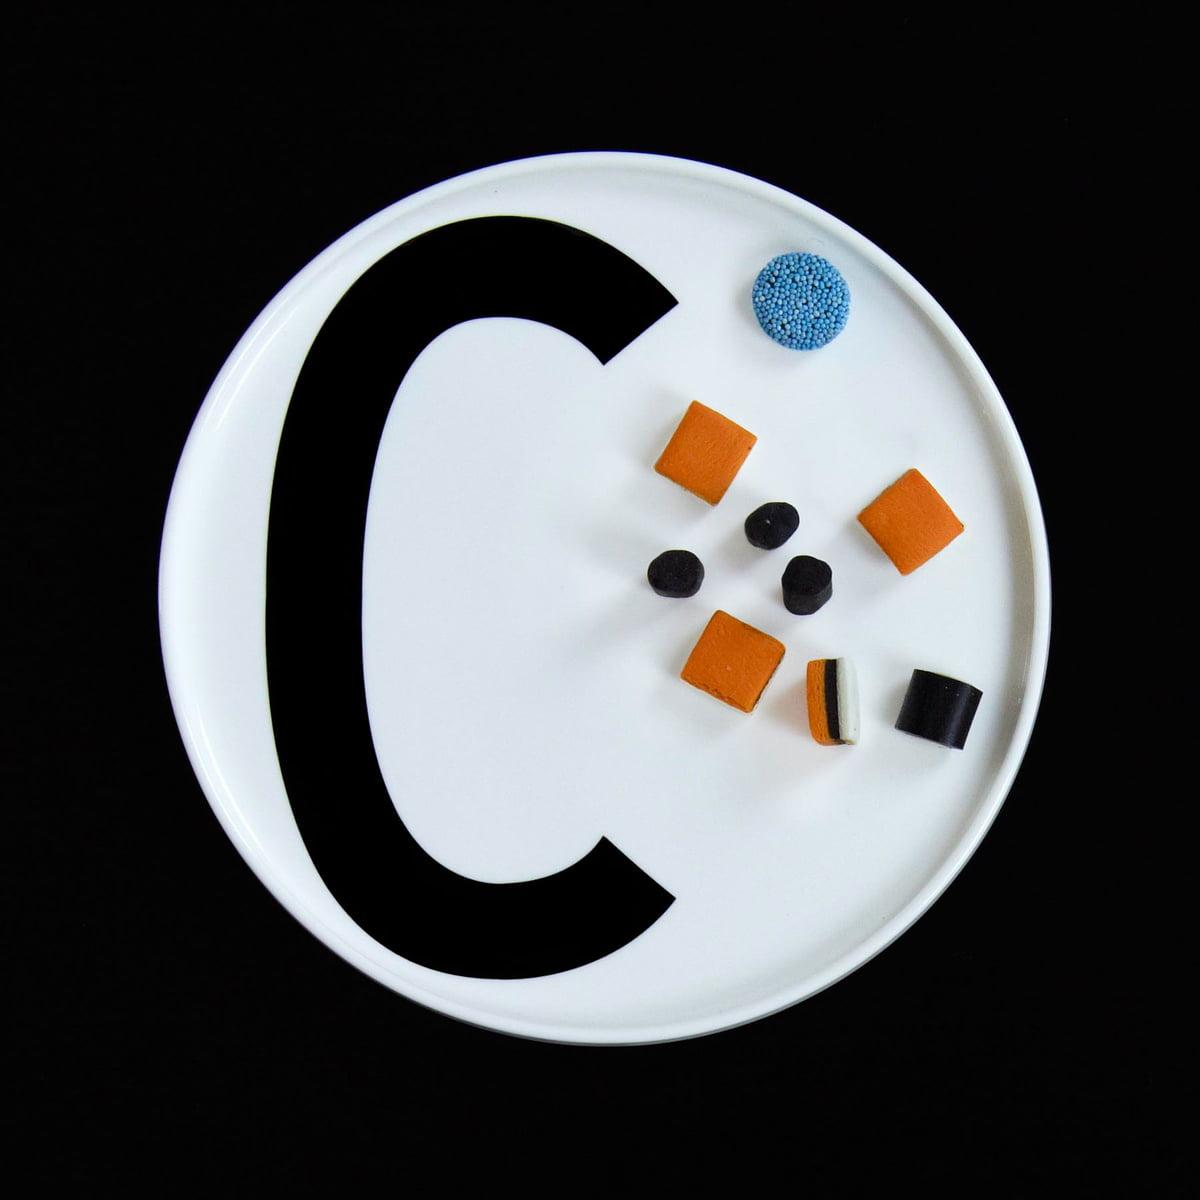 Design Teller buchstaben teller design letters im shop